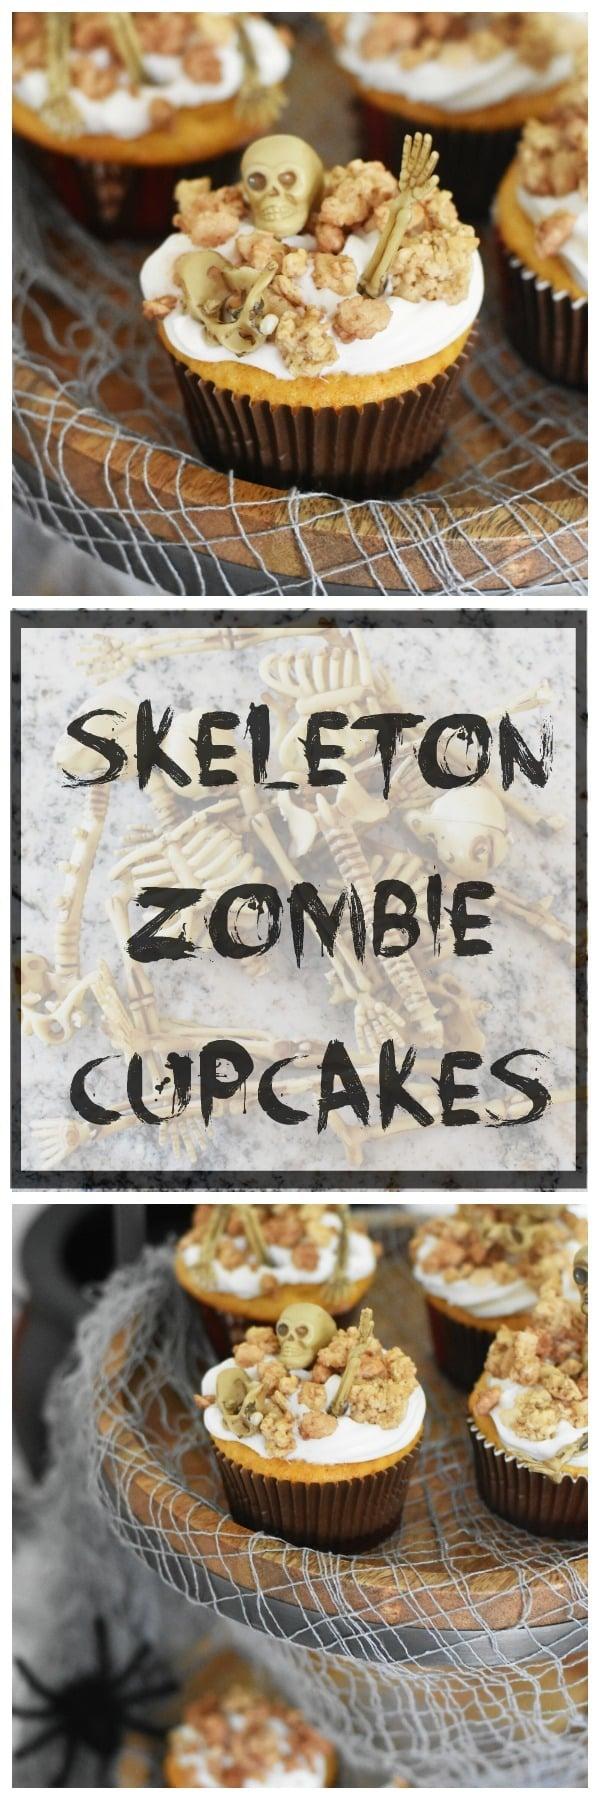 Skeleton Zombie Cupcakes